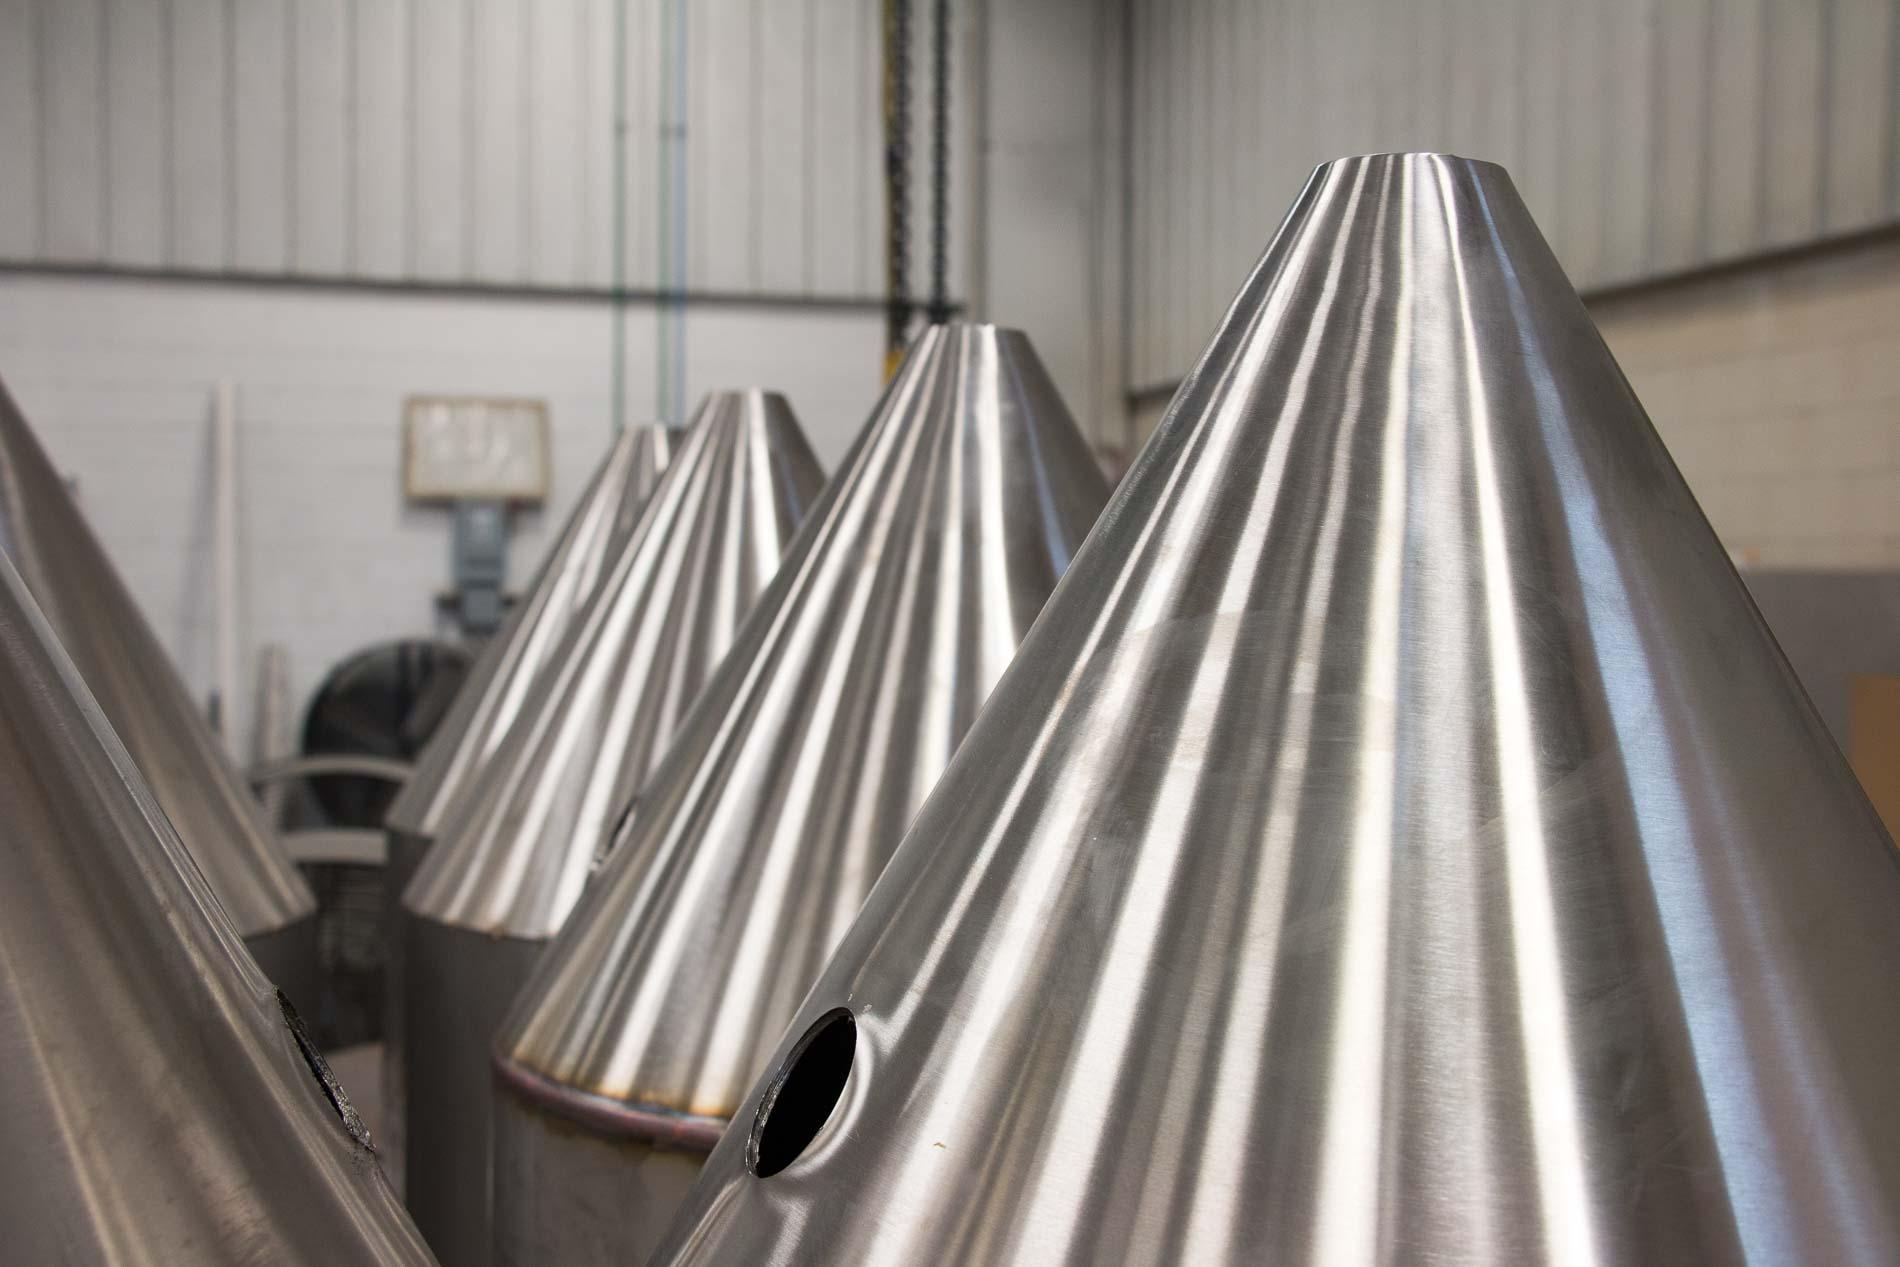 custom sheet metal fabrication, dairy industry fabrication